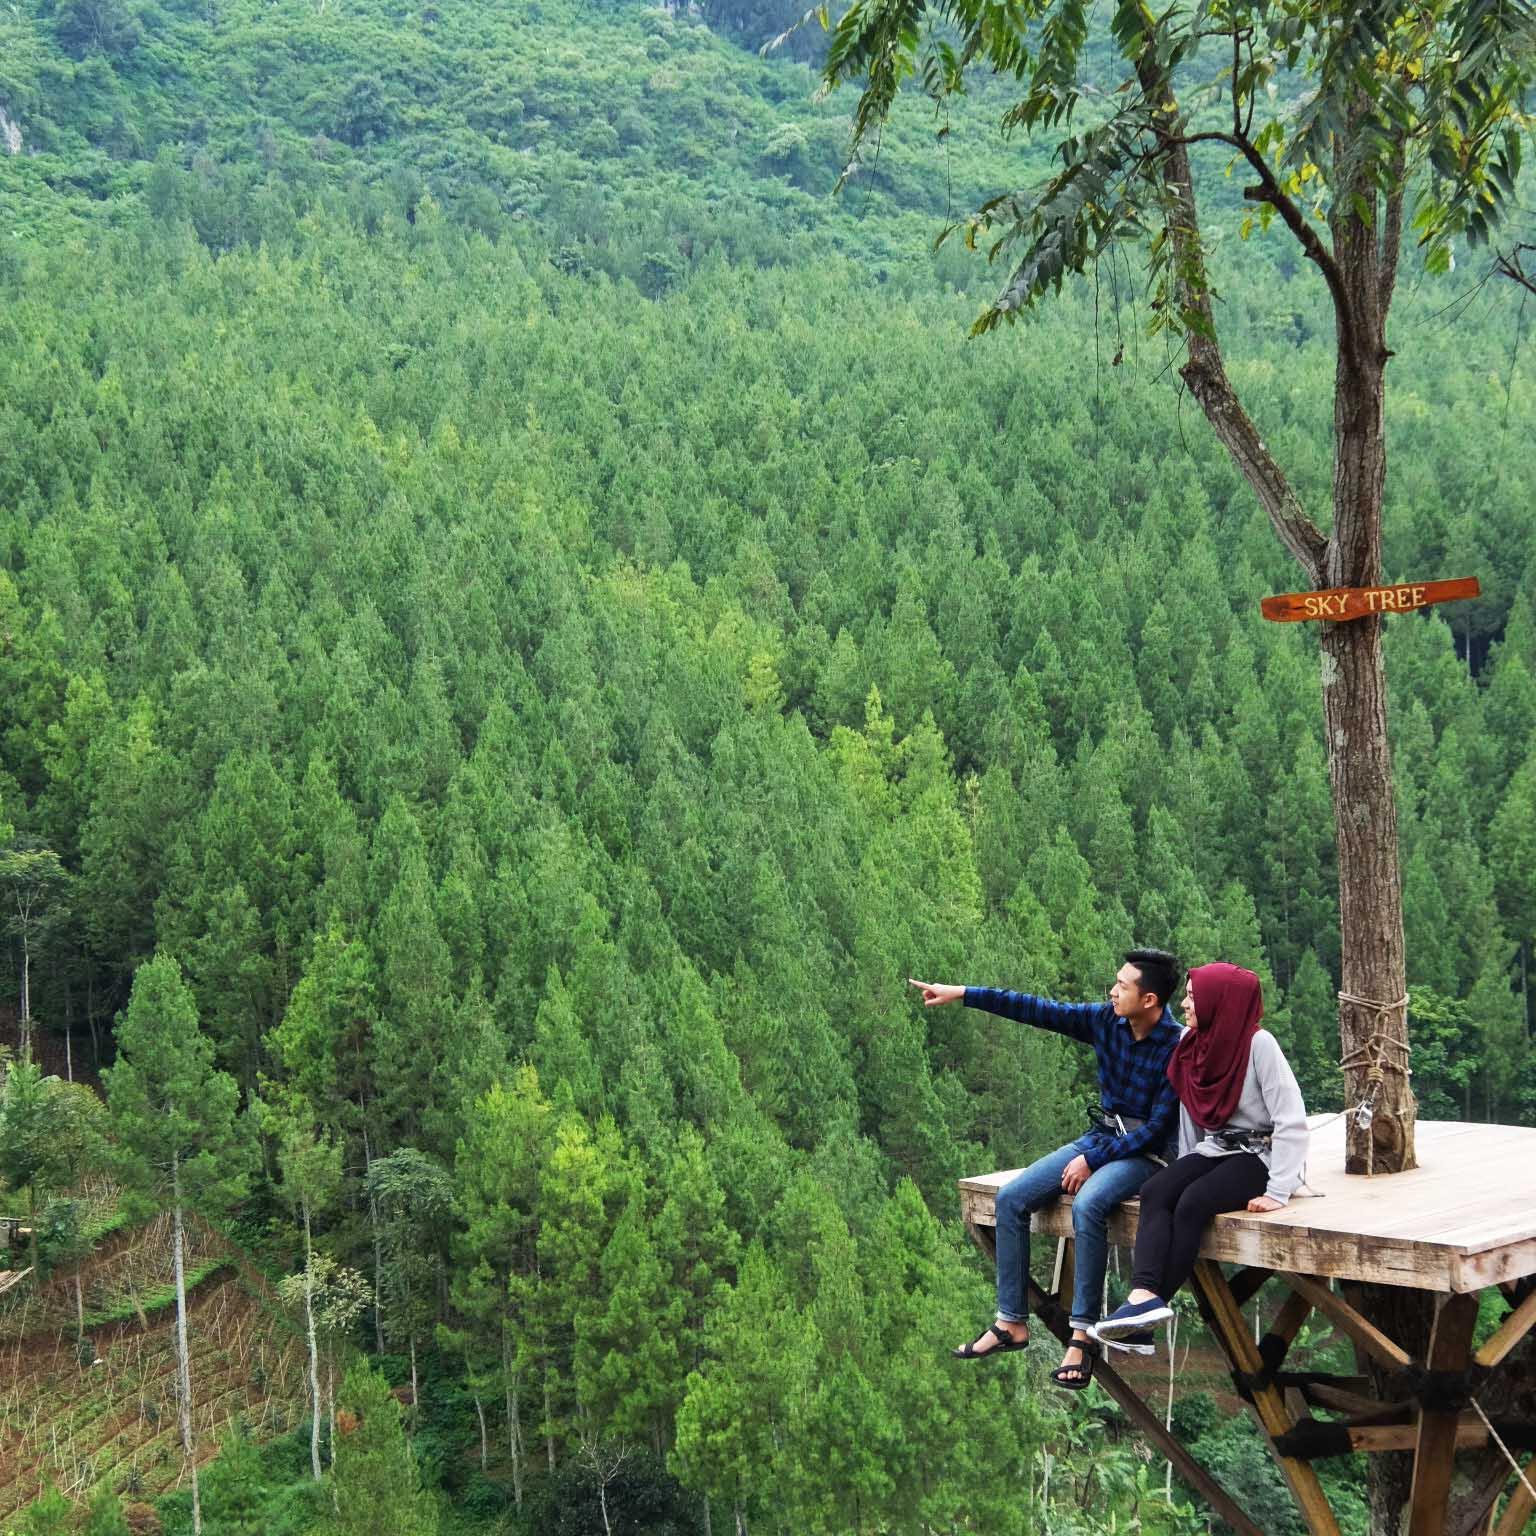 Mangkuk Orat Oret Ira Menguji Sabar Lodge Maribaya Kab Bandung